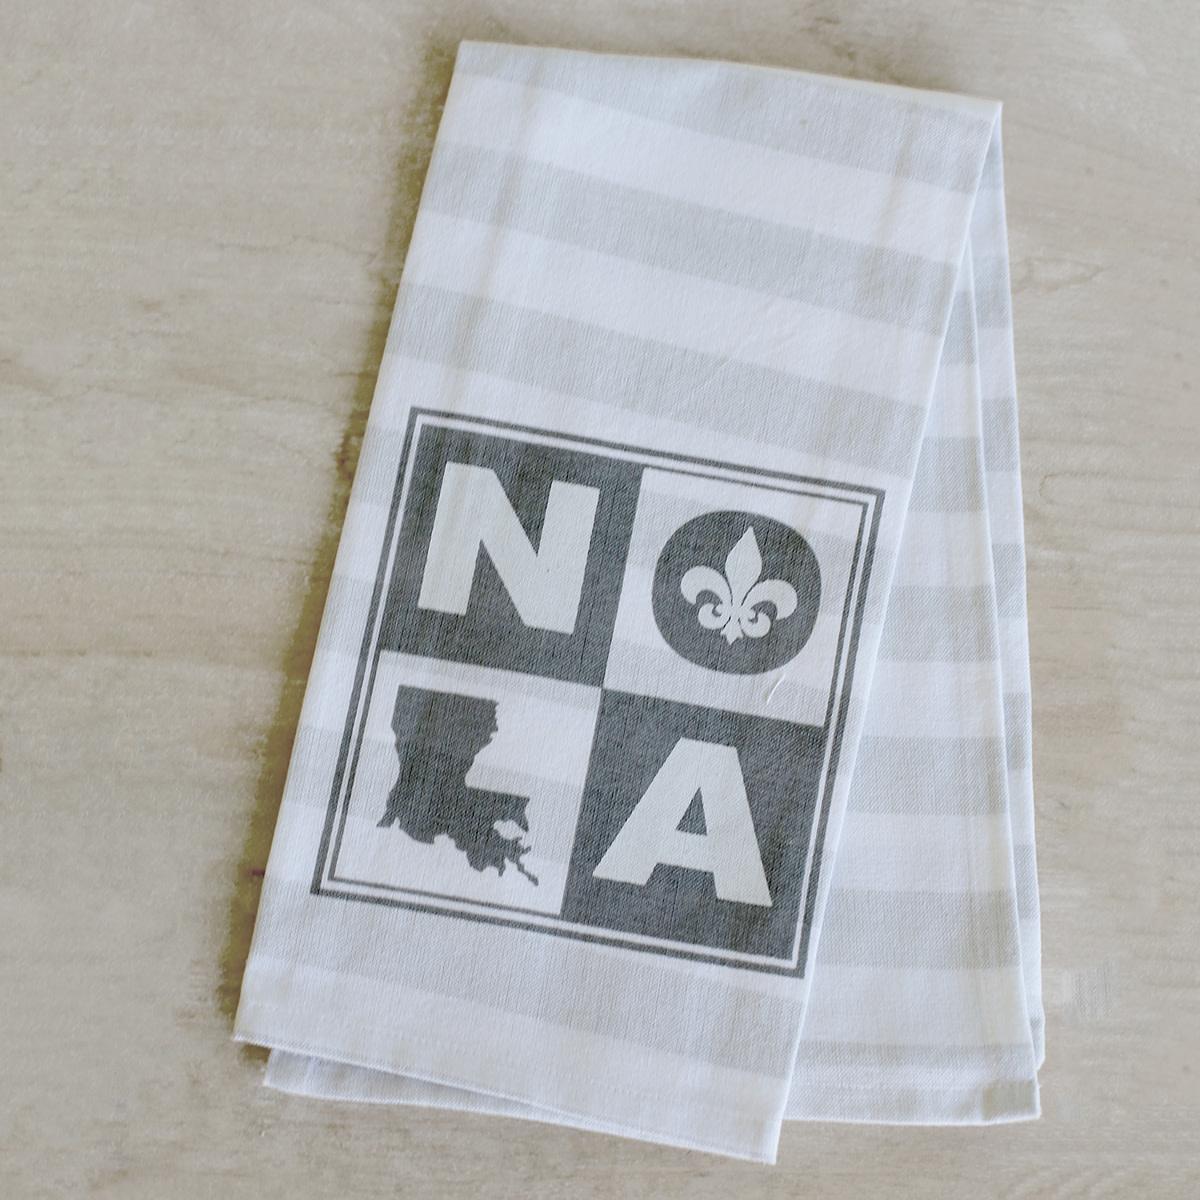 NOLA Hand Towel